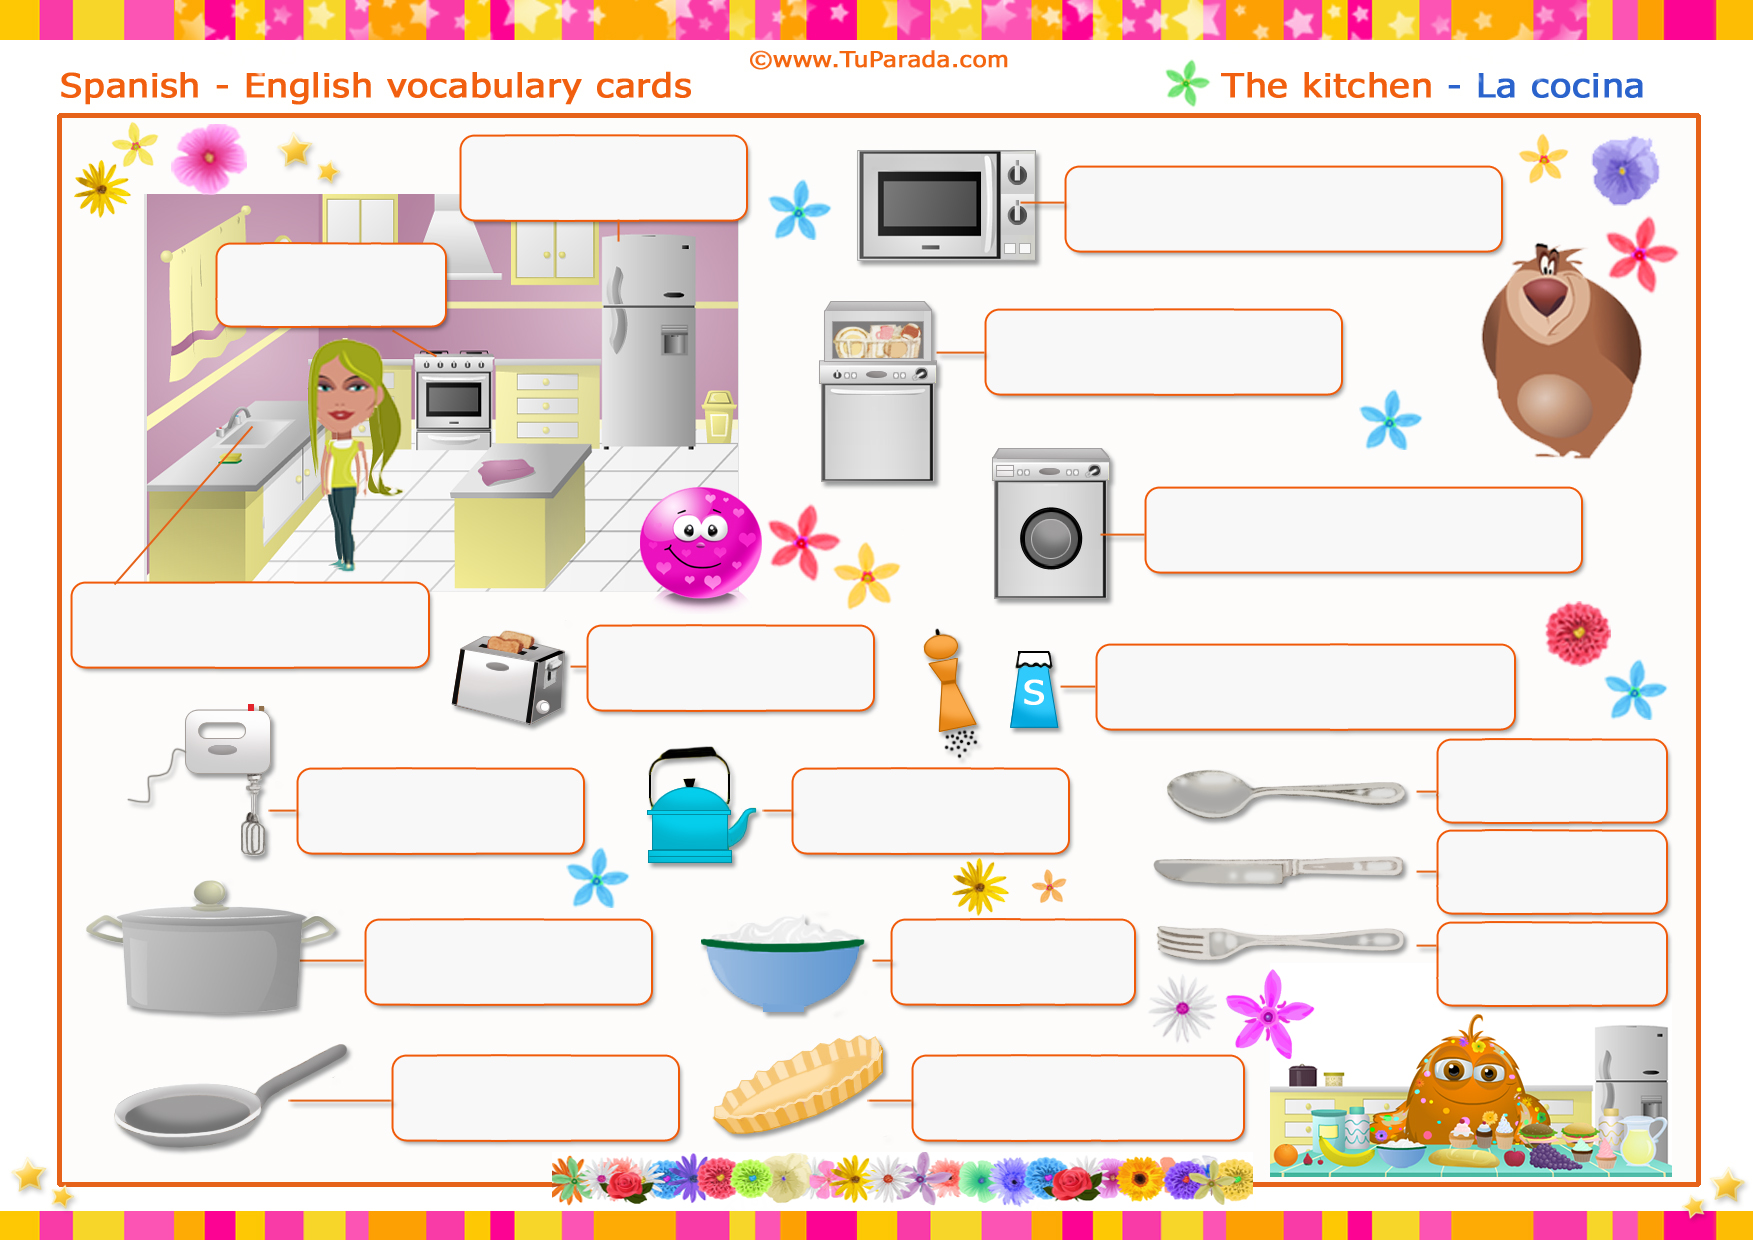 Vocabulario Cocina  Kitchen Imprimir  Vocabulario